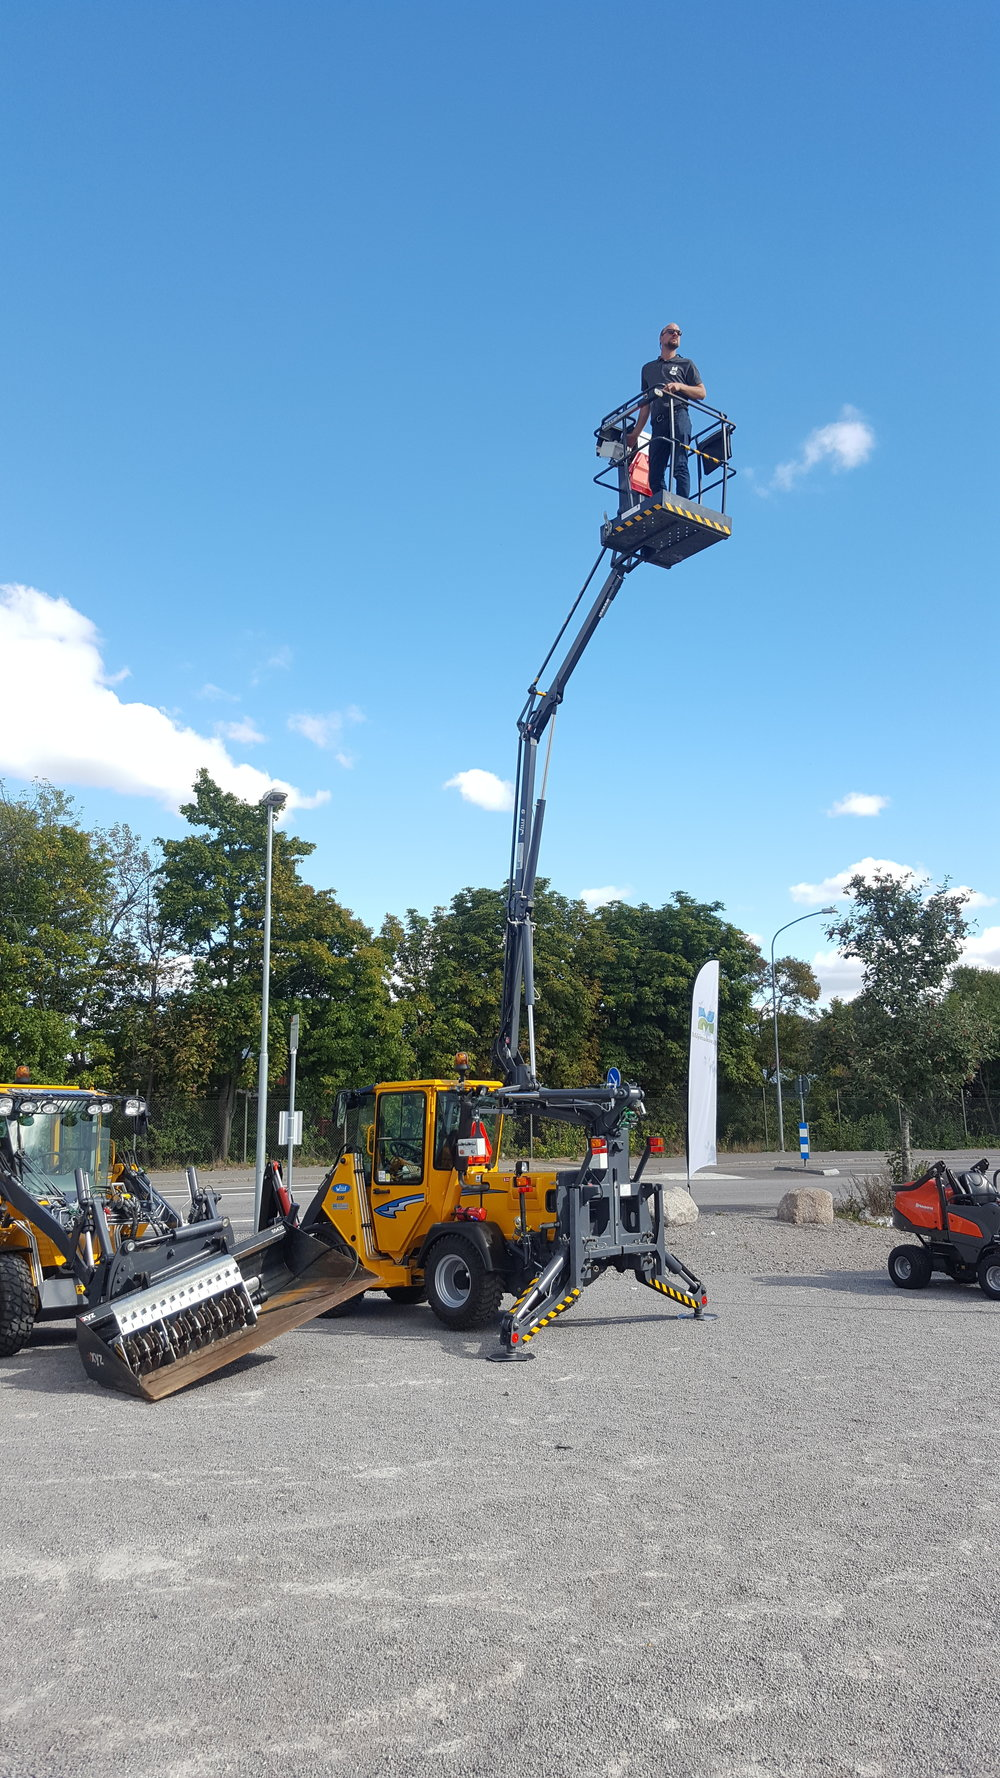 Wille Skylift 9 på mässa i Norrköping.